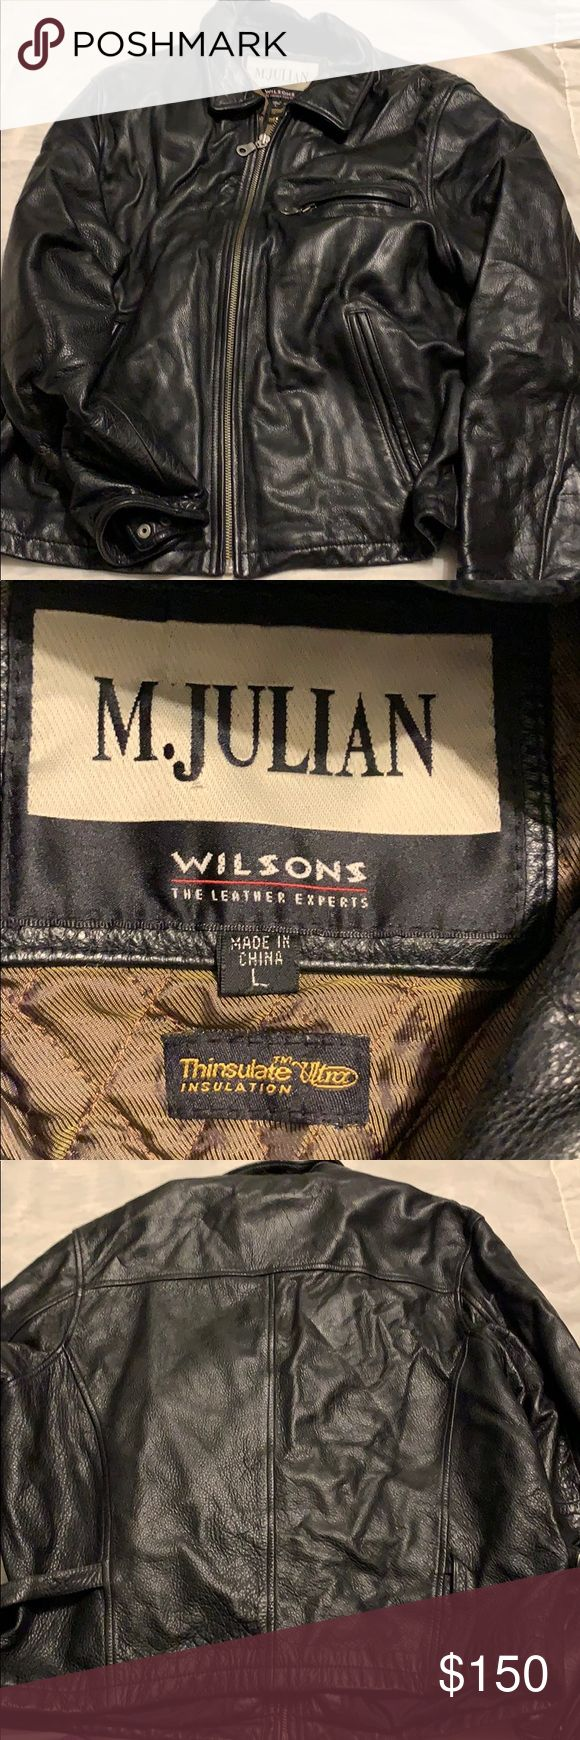 Size L black M. Julian heavy leather coat Leather coat